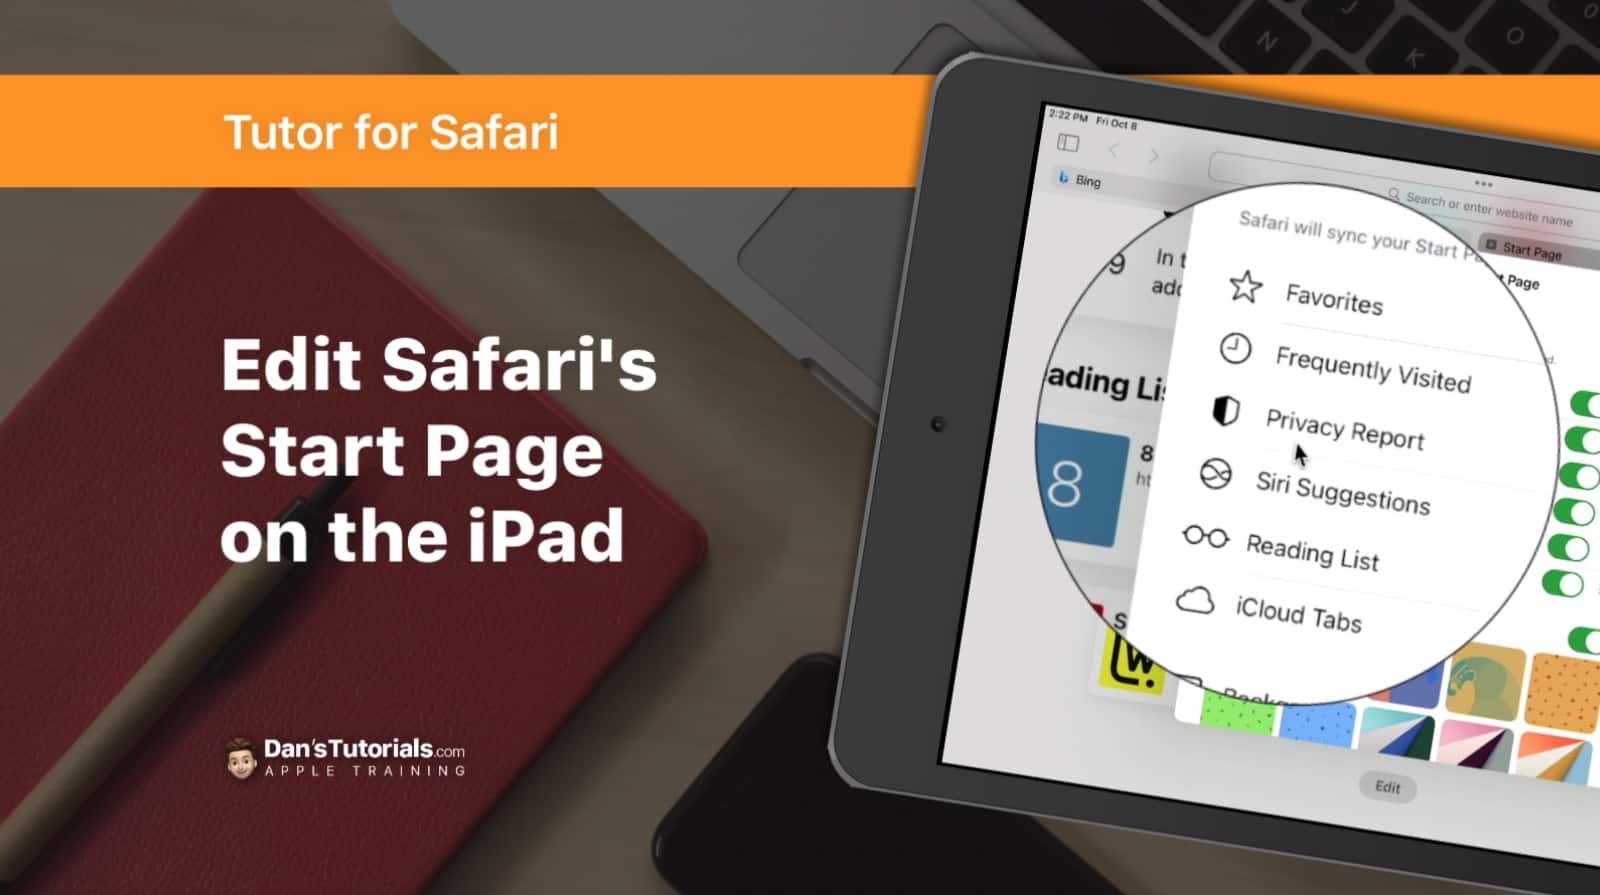 Edit Safari's Start Page on the iPad